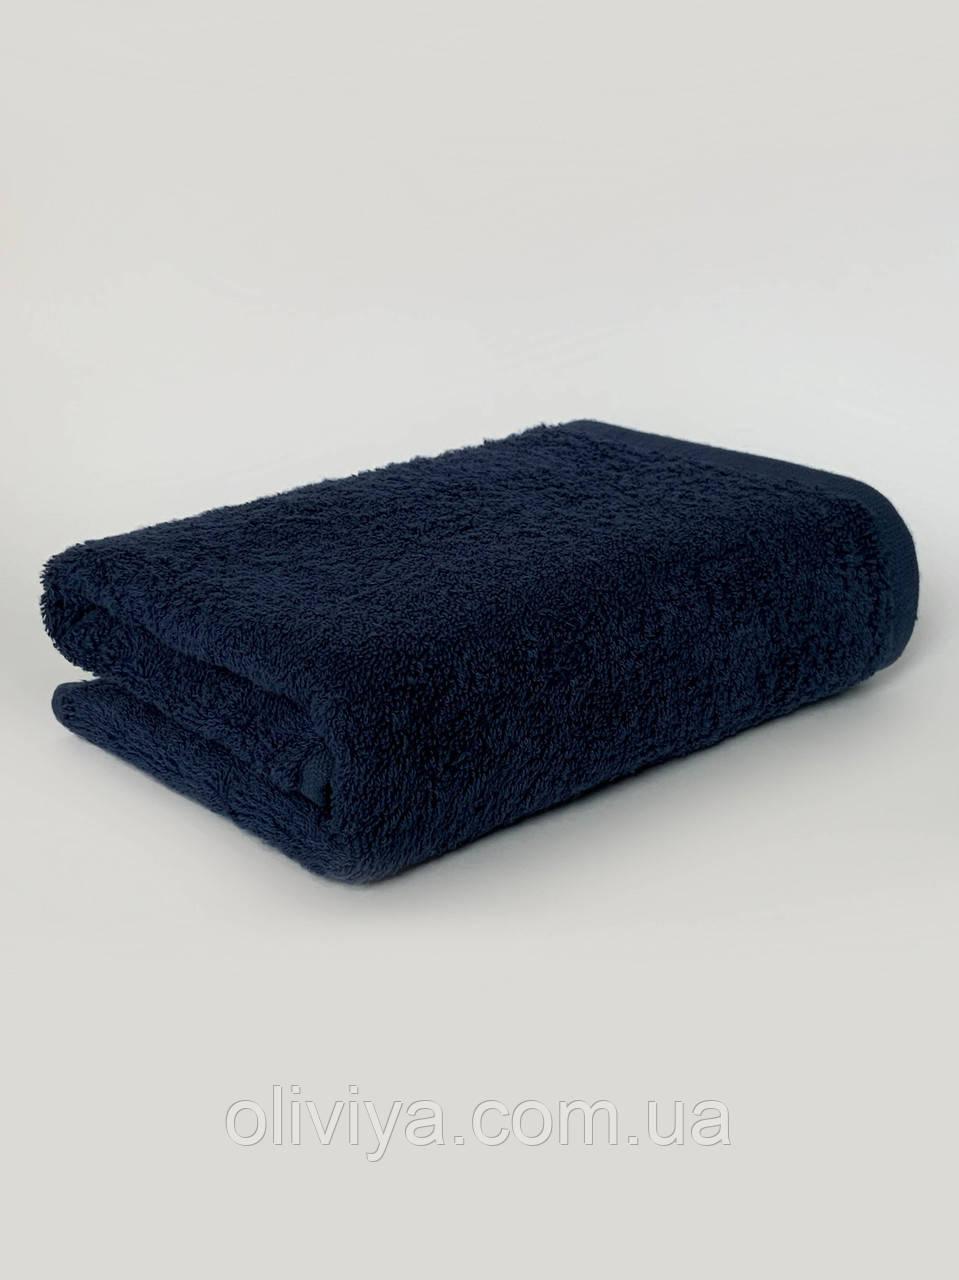 Полотенце для рук и ног темно-синее